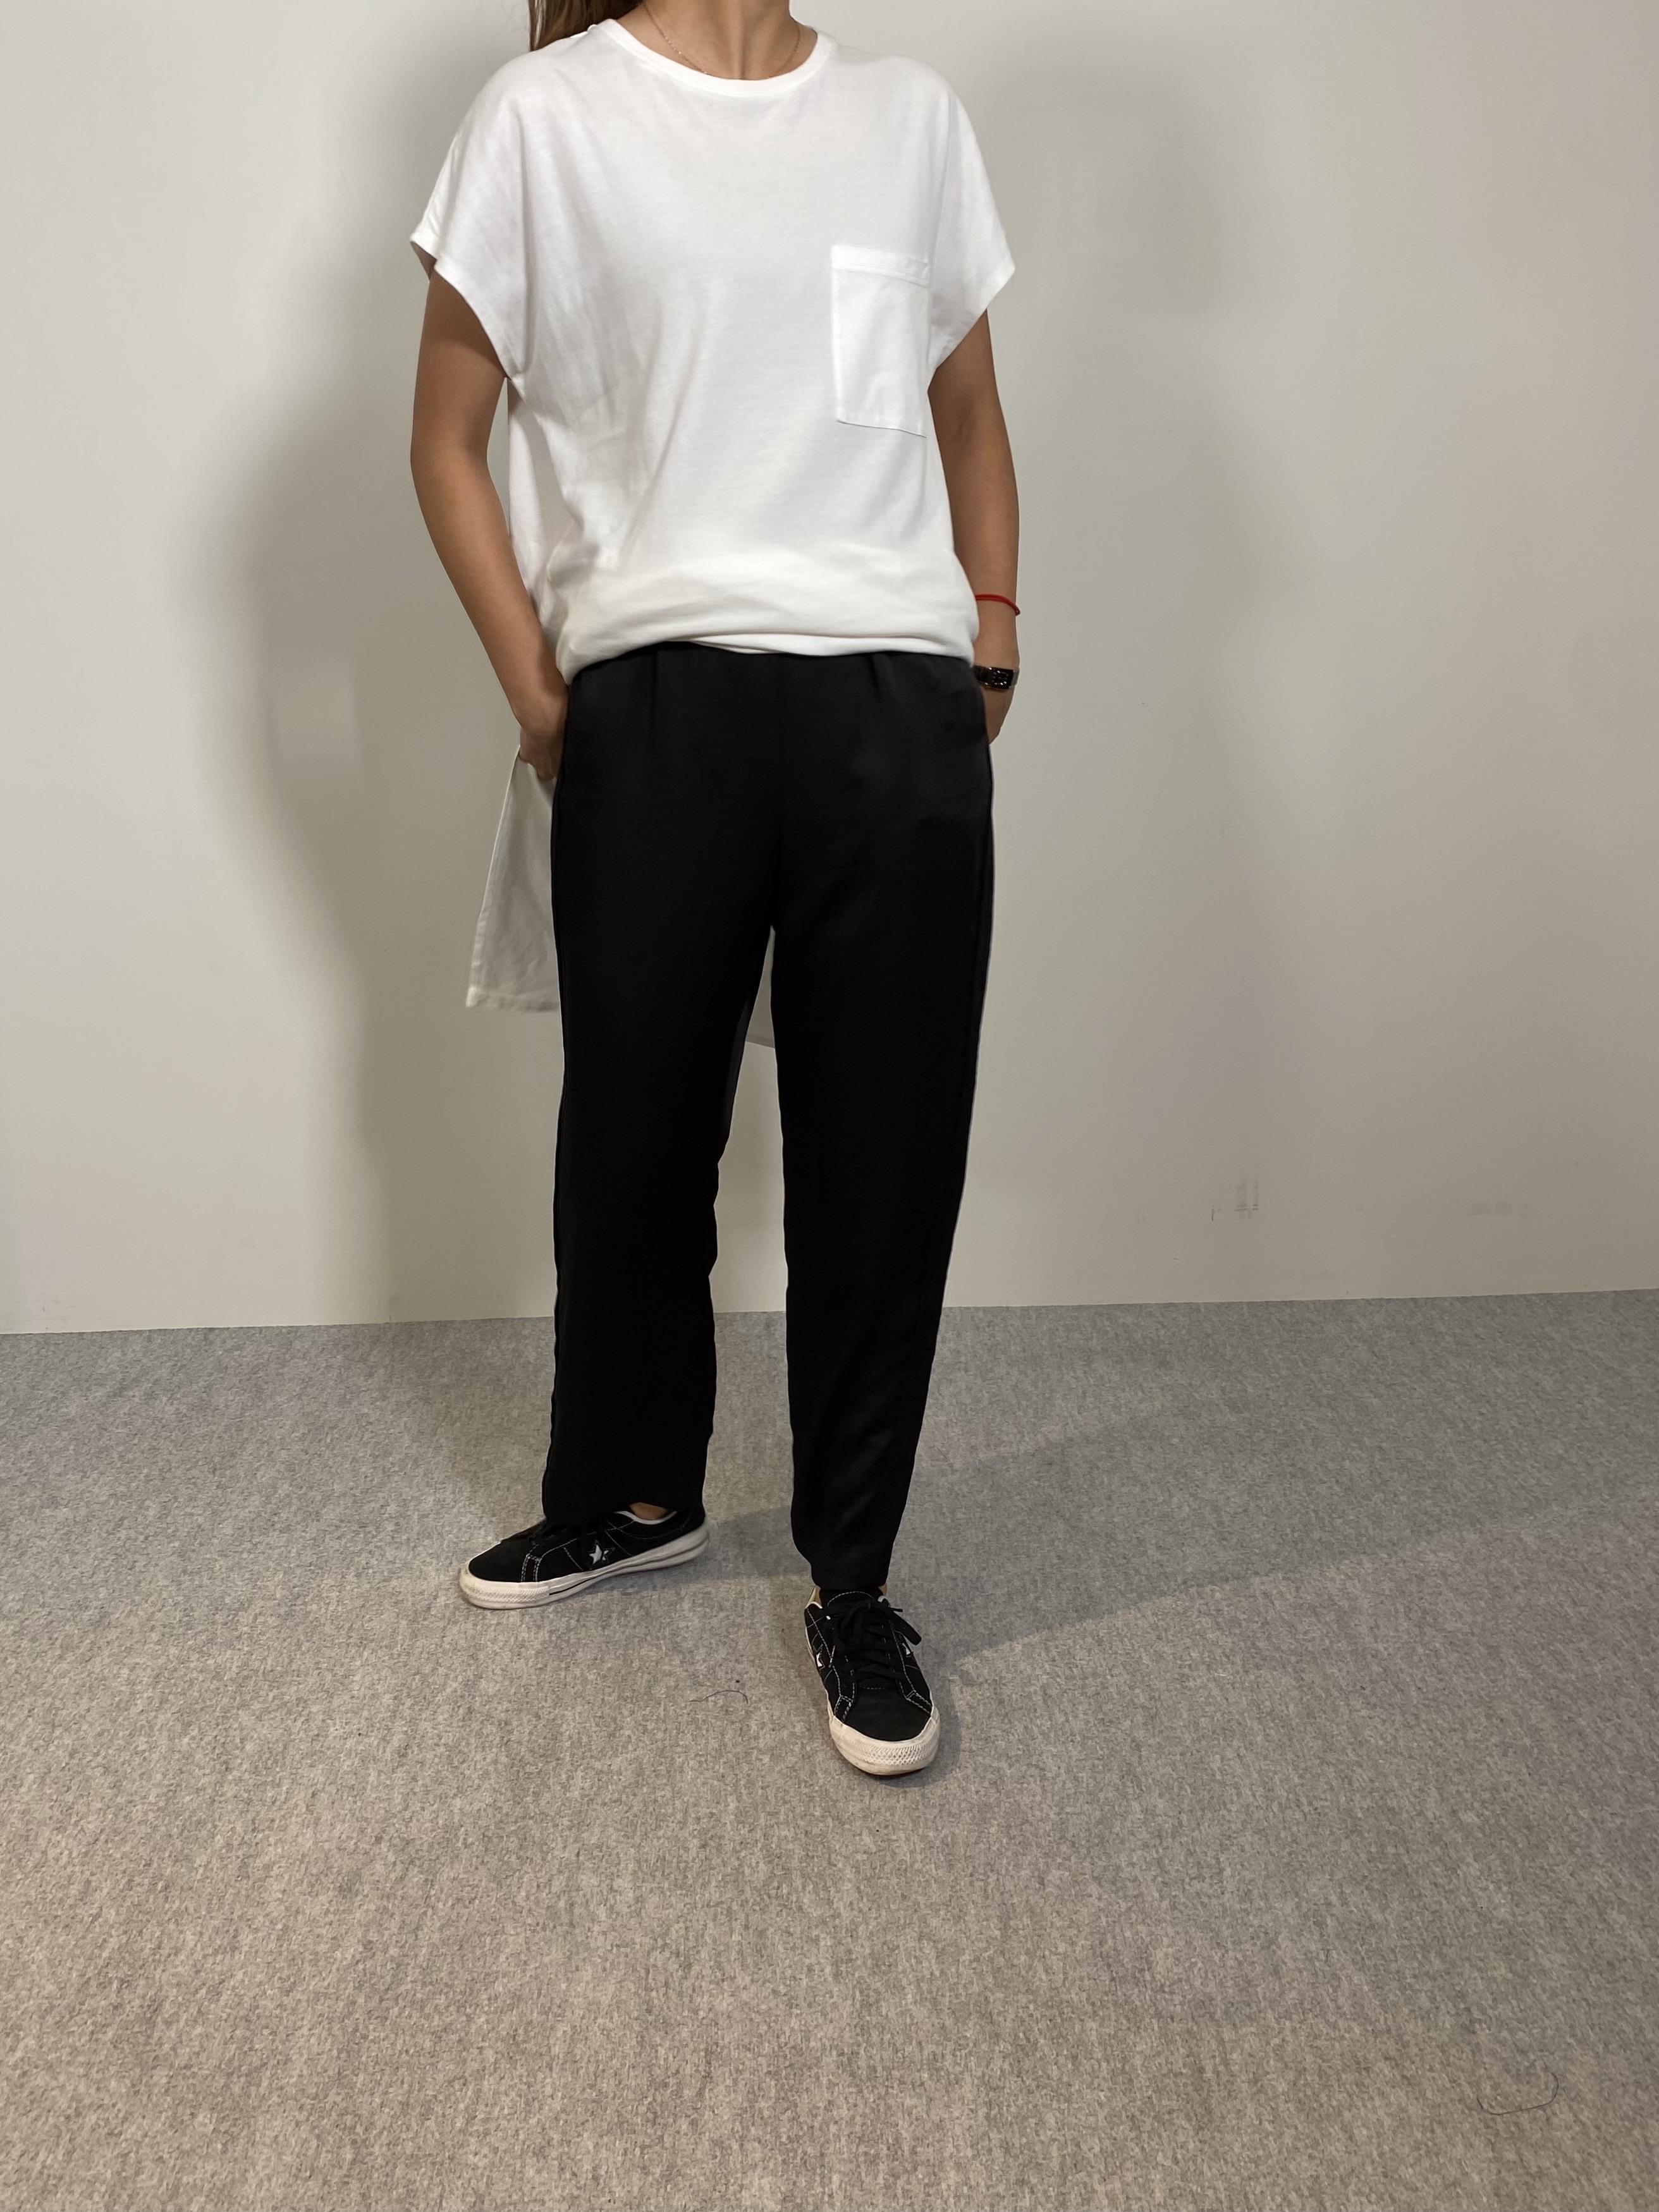 Women's COMFORT DRESS TUNIC T-SHIRTの着用画像9